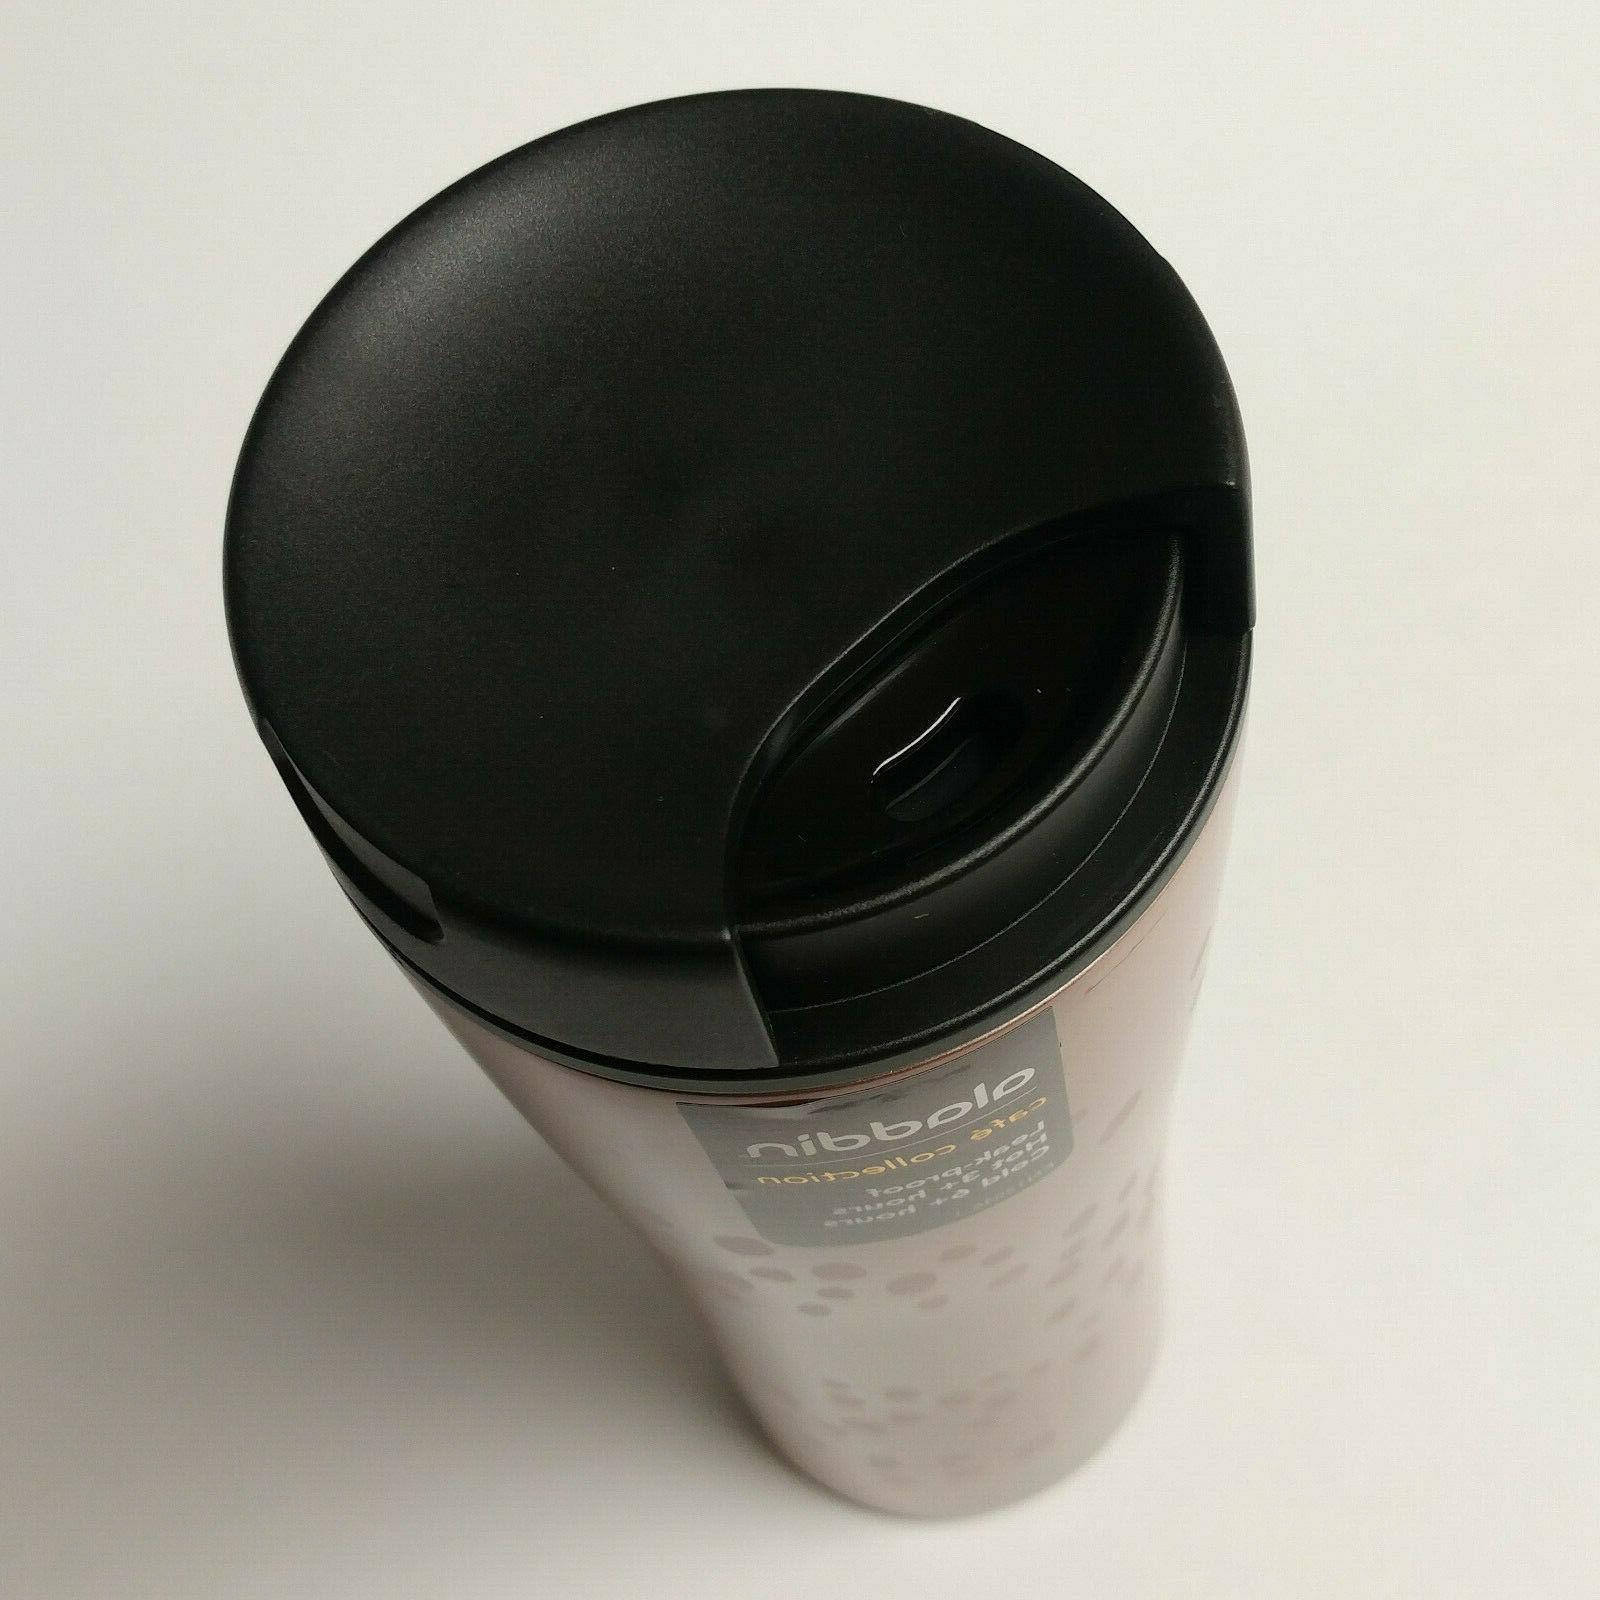 NWT rose black 16oz travel mug tumbler Cafe Collection coffee